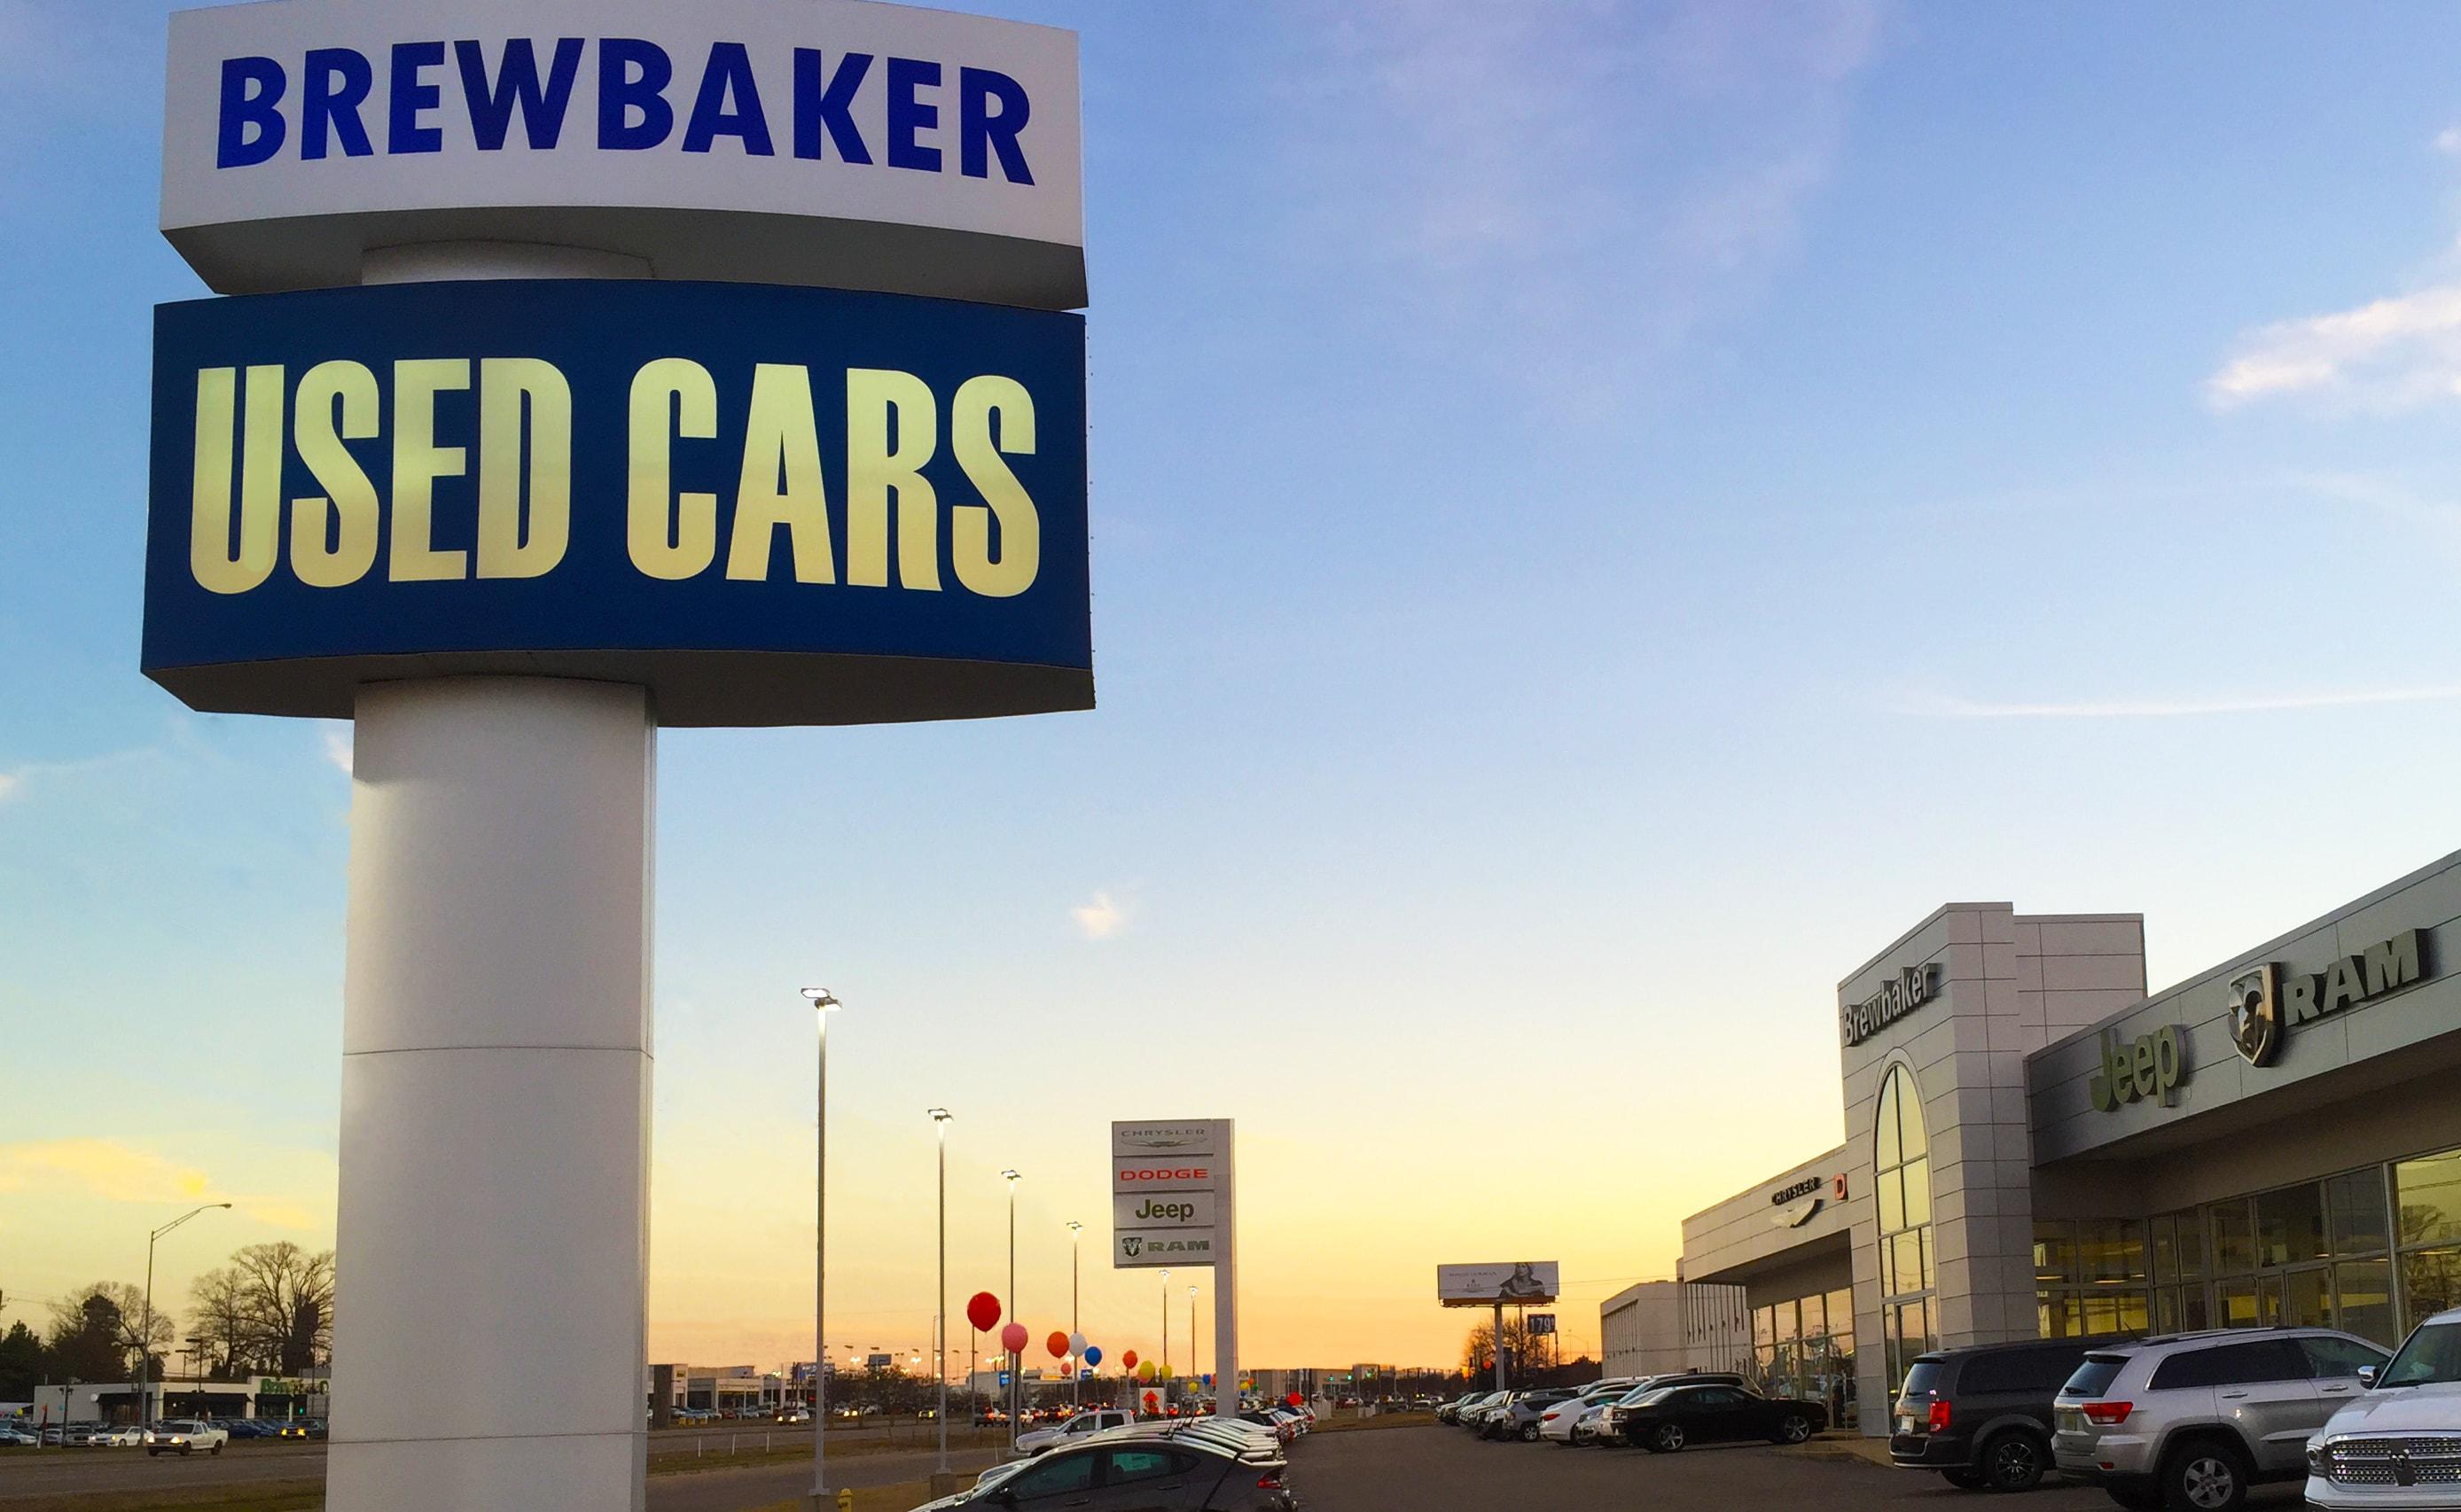 Brewbaker Preowned   Used dealership in Montgomery, AL 36117